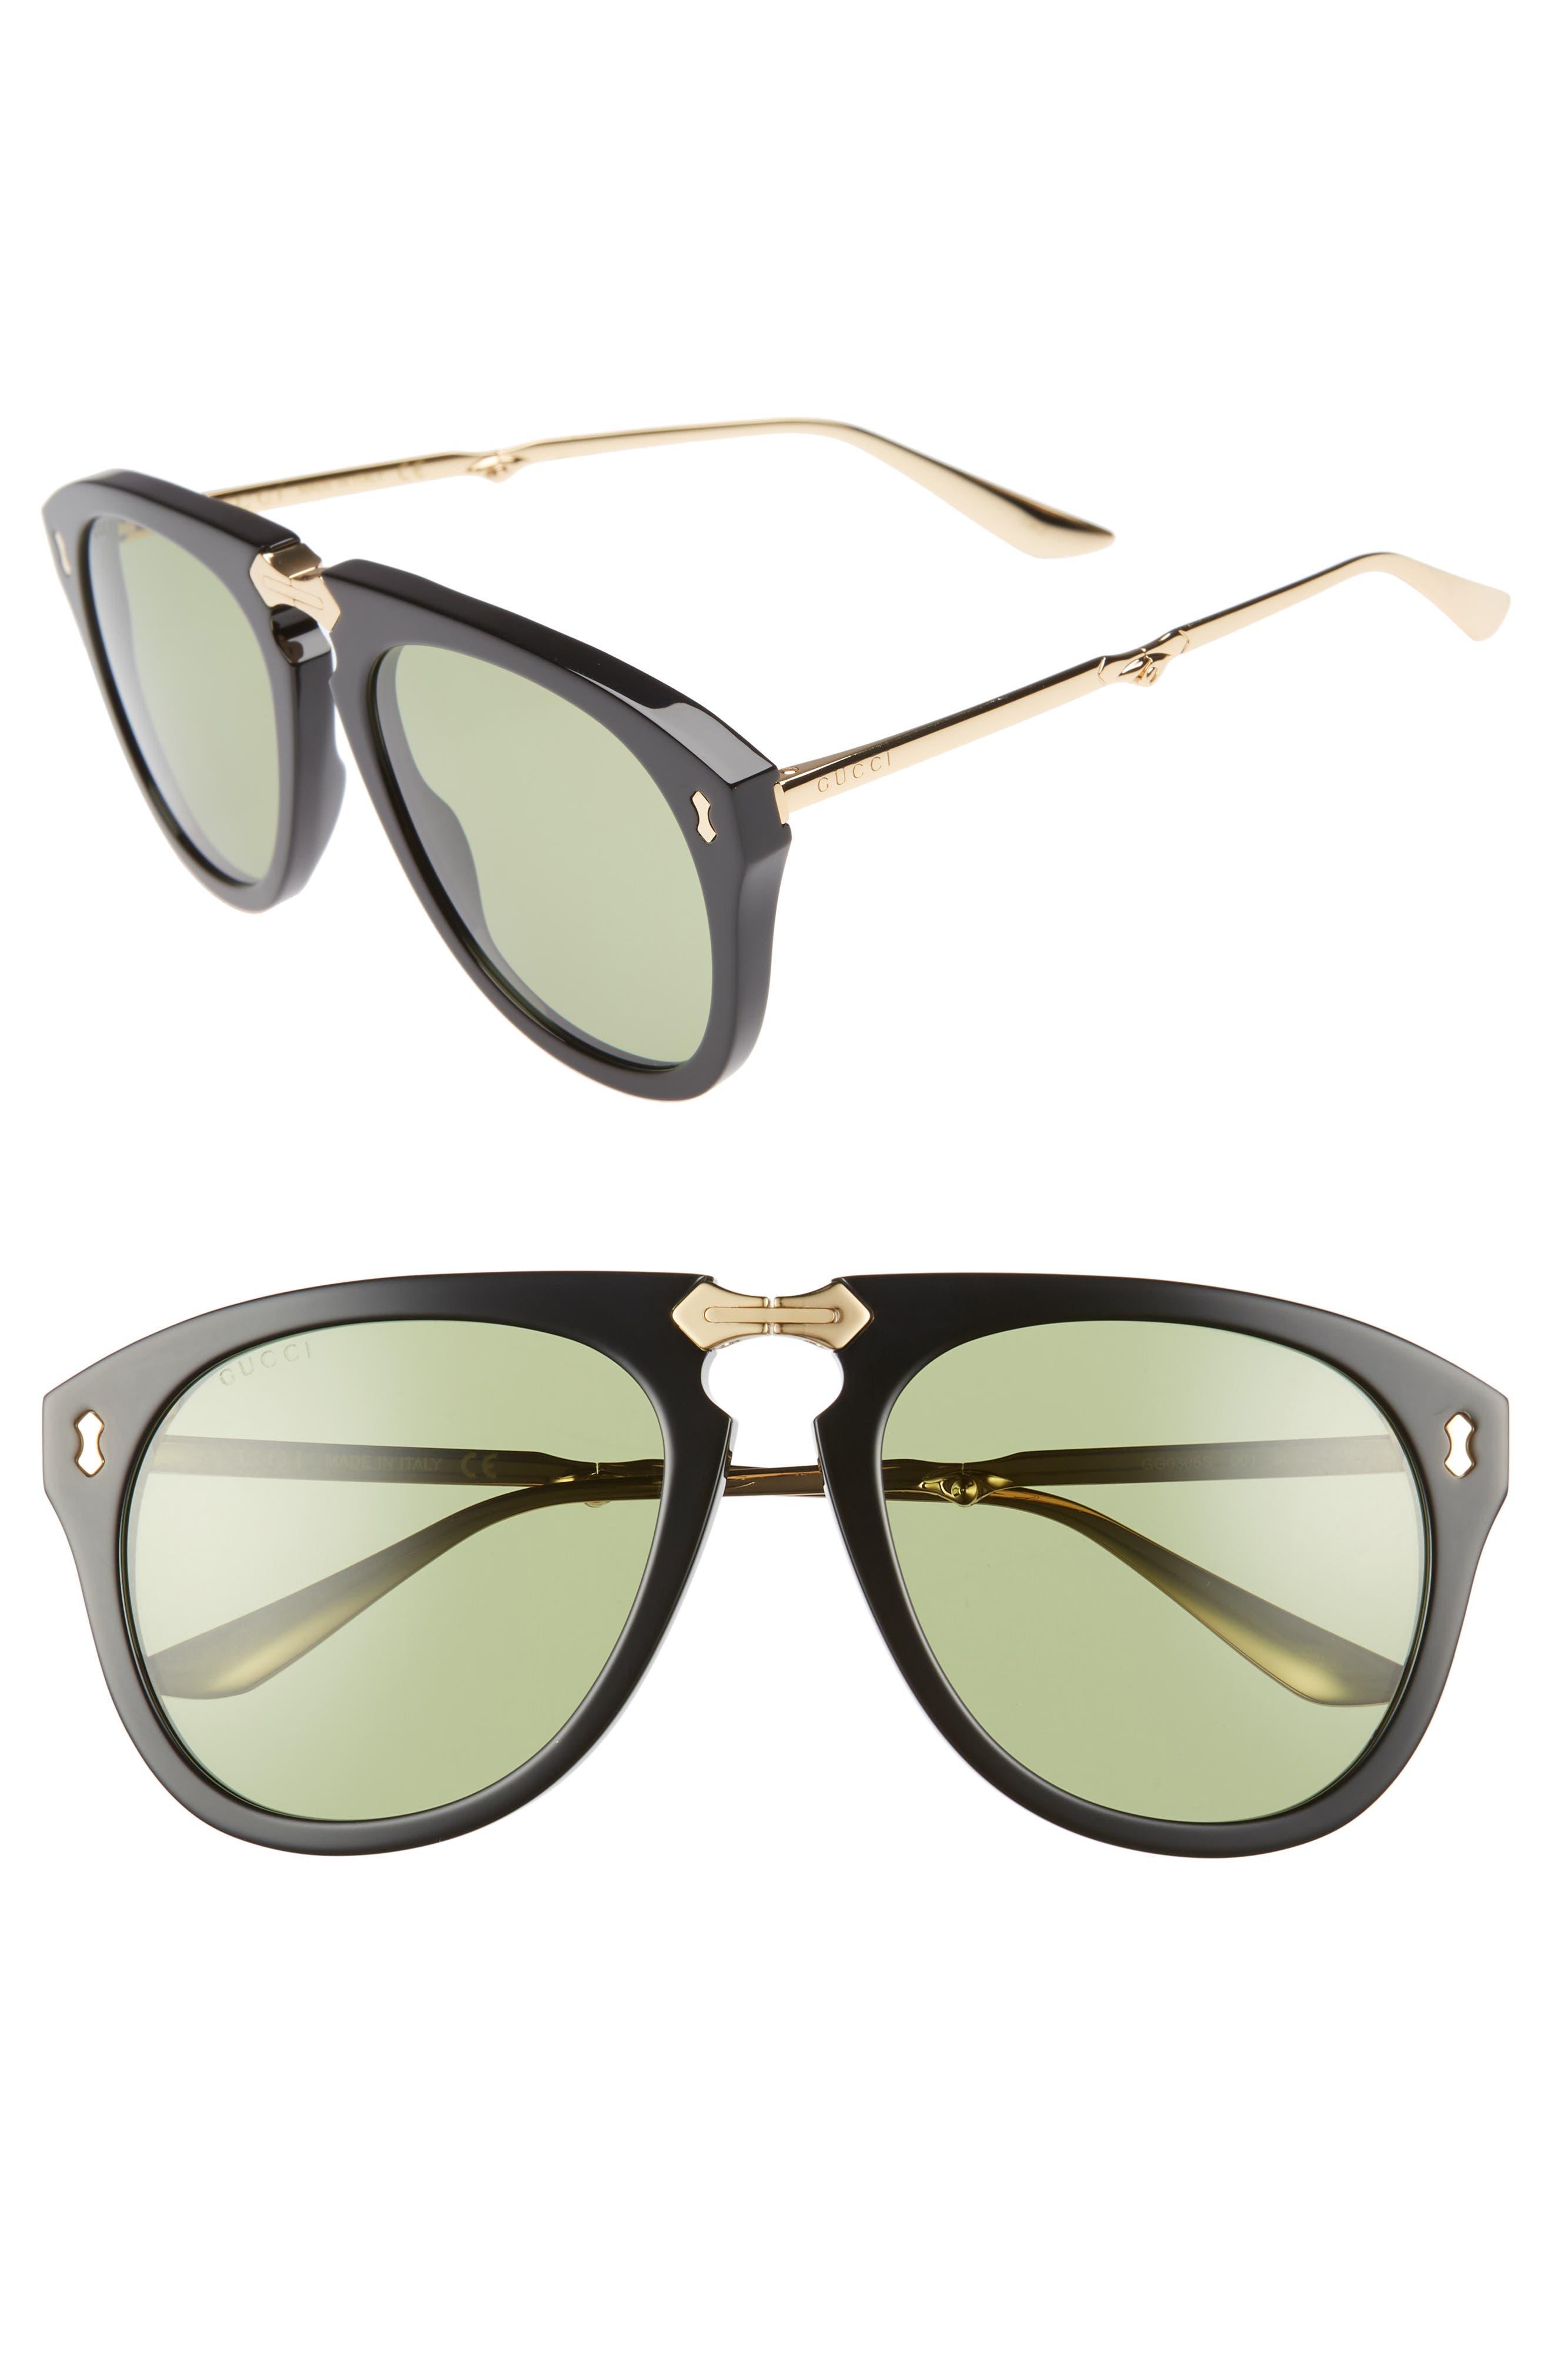 56mm Aviator Sunglasses,                         Main,                         color, BLACK/ GOLD/ GREEN